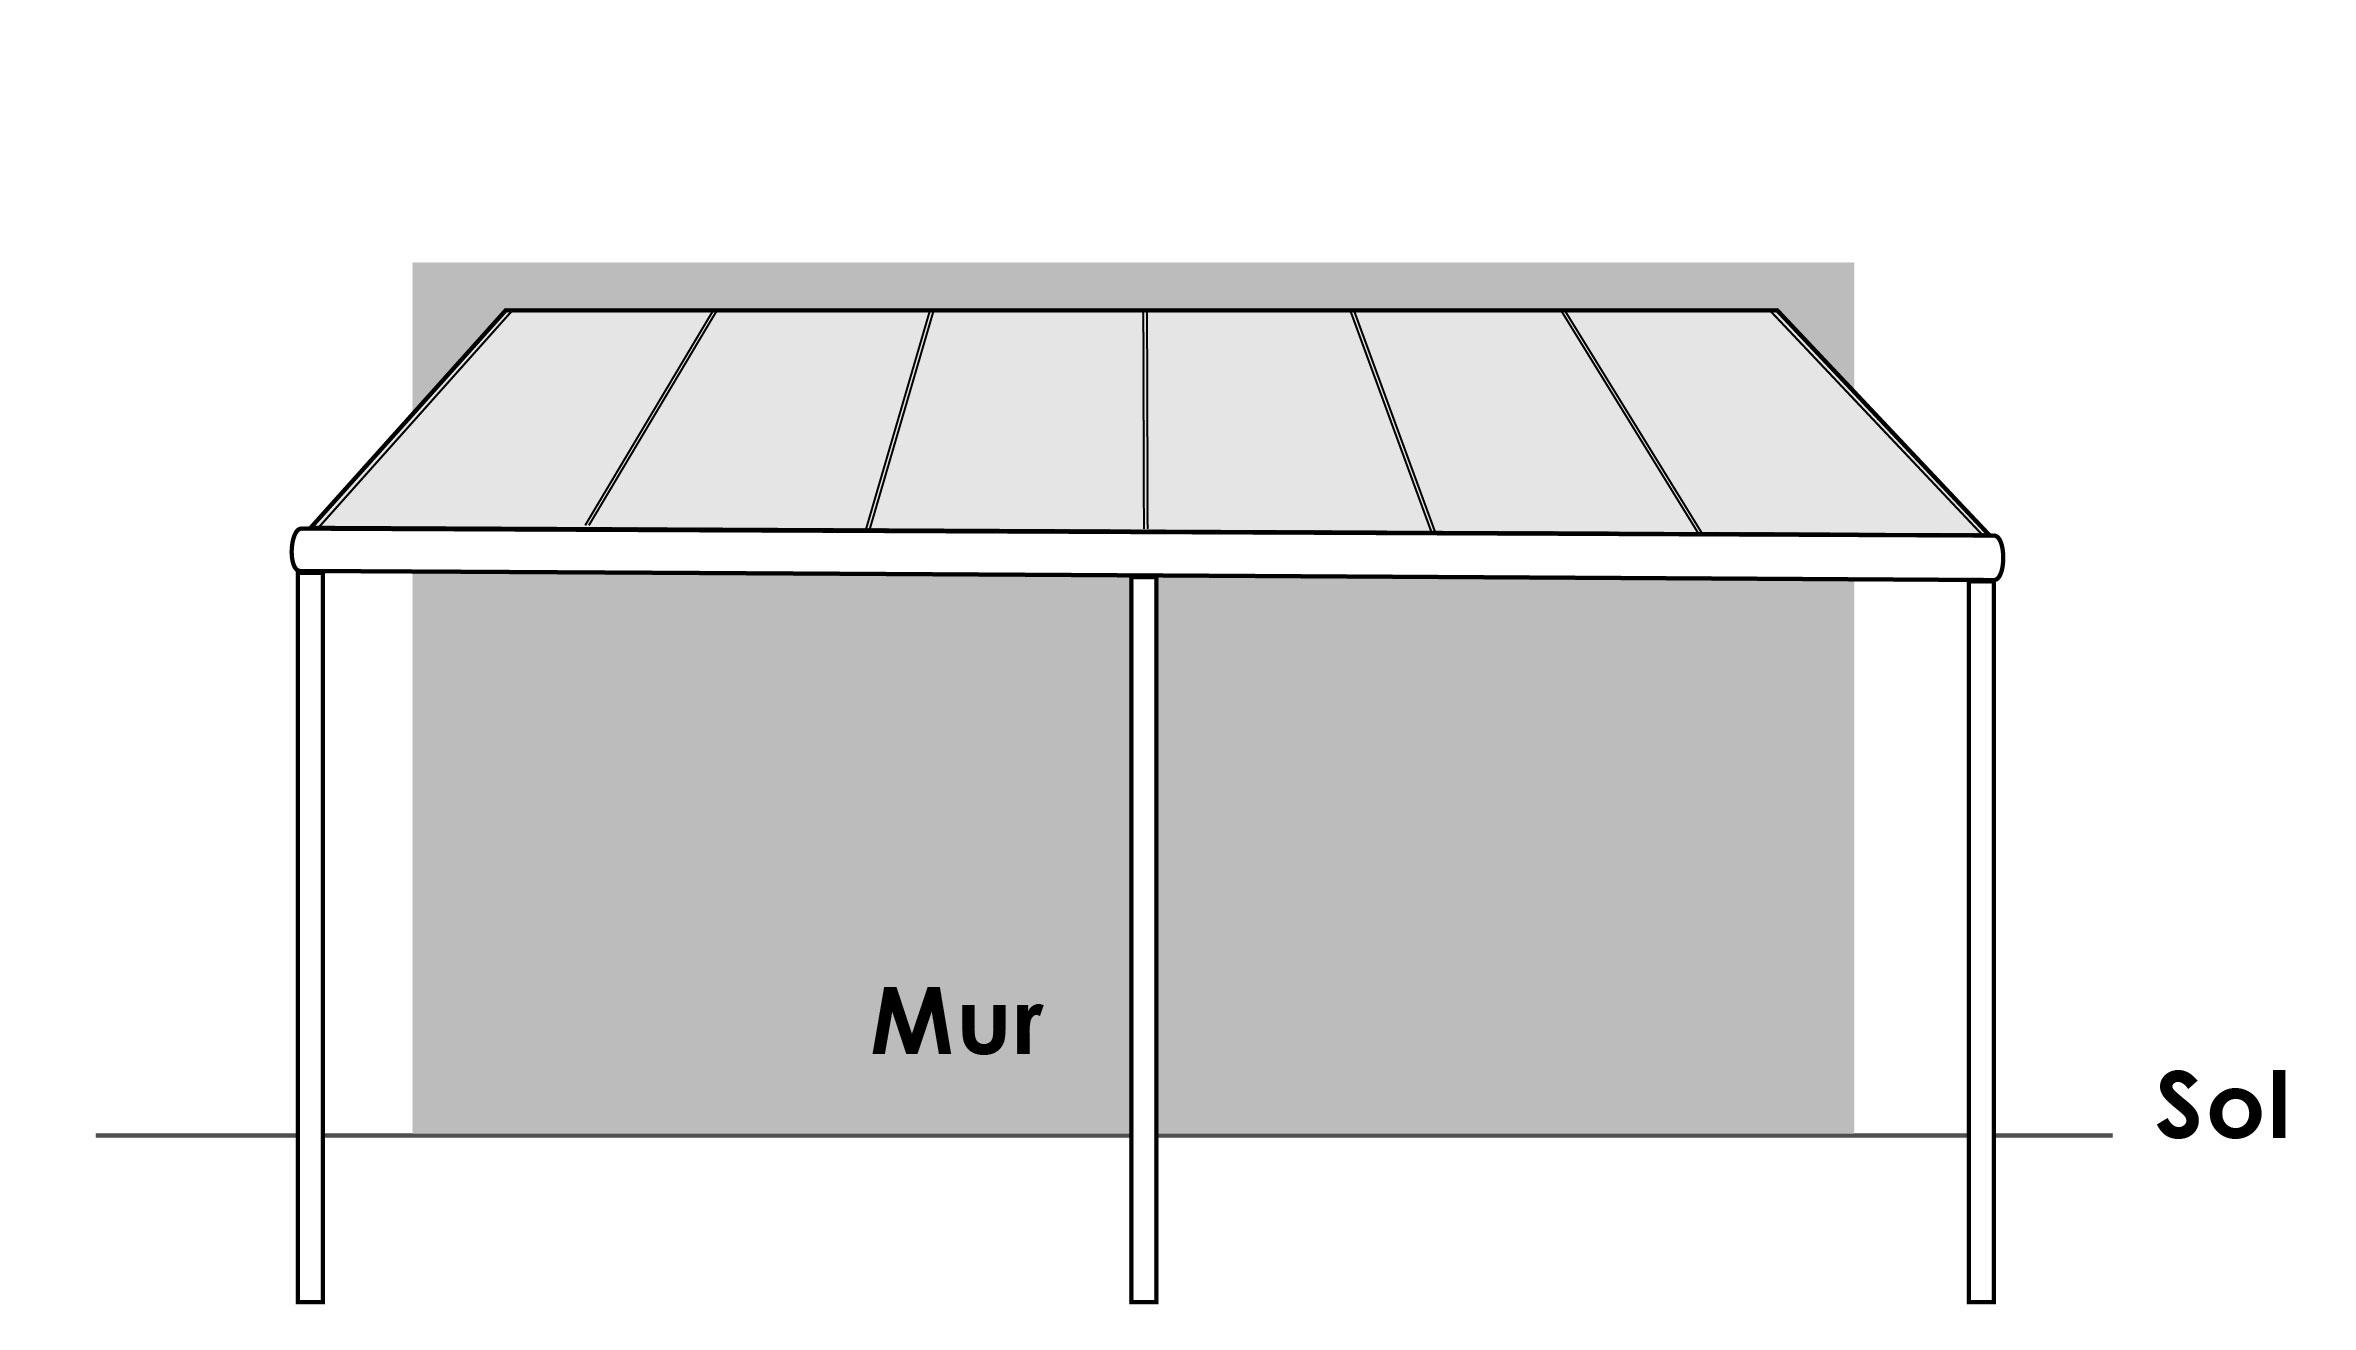 Plaque de polycarbonate leroy merlin plaque for Plaque polycarbonate pour pergola